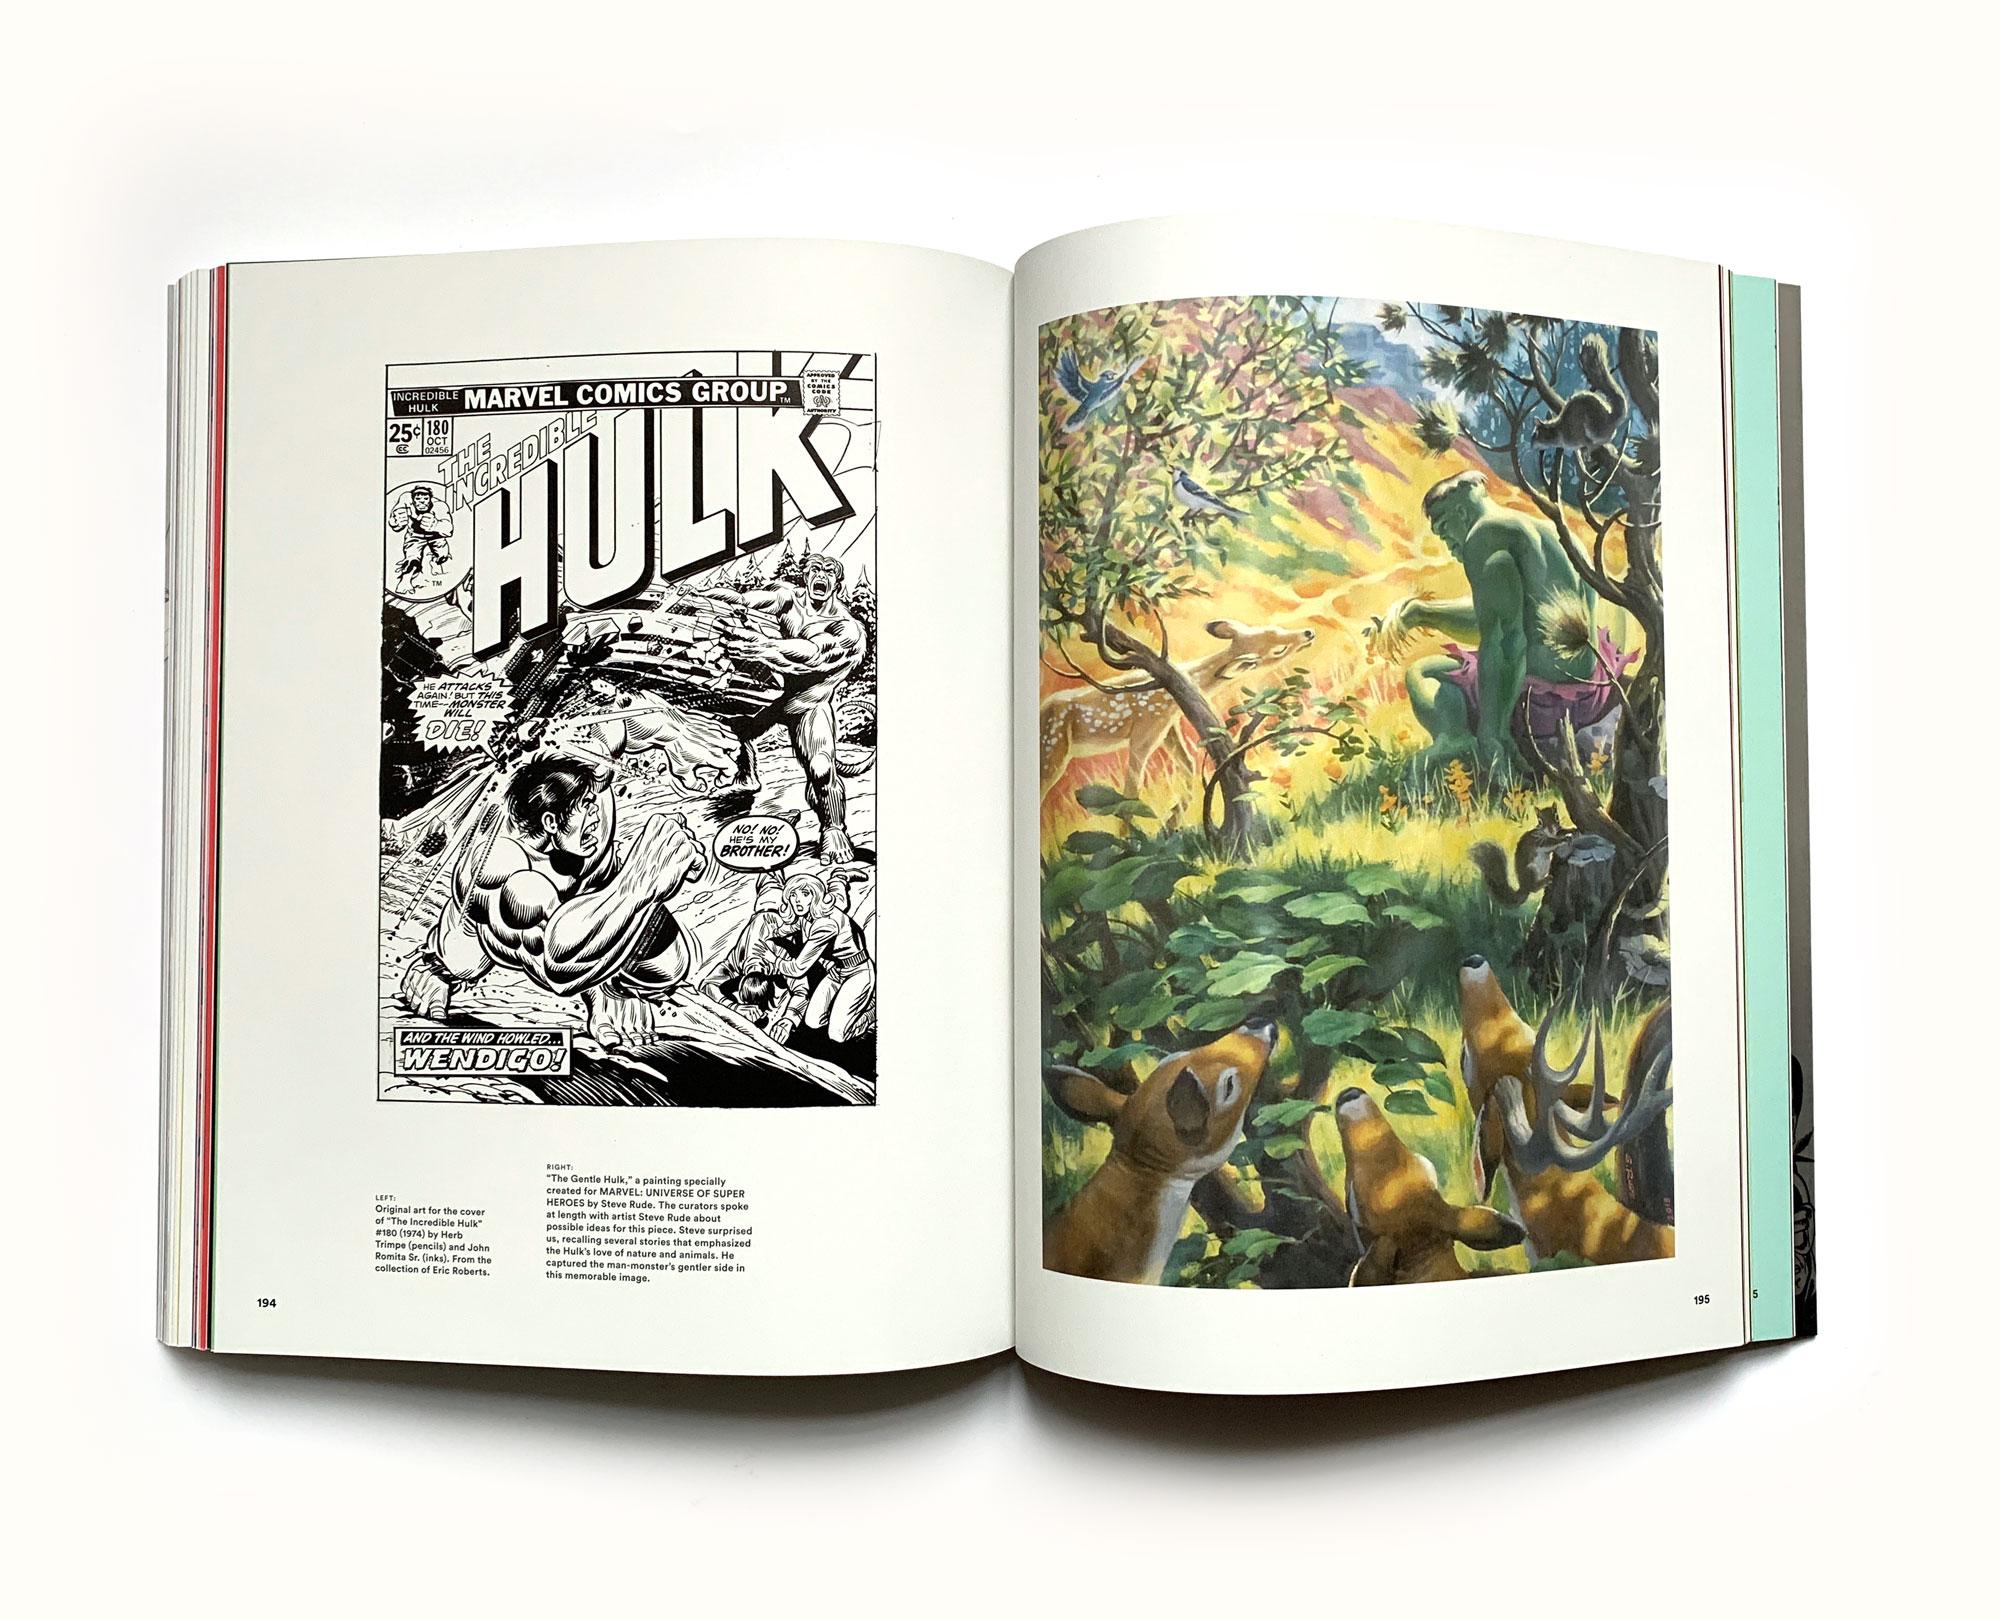 Marvel-Universe-of-Super-Heroes-Book-Hulk-Balgavy.jpg